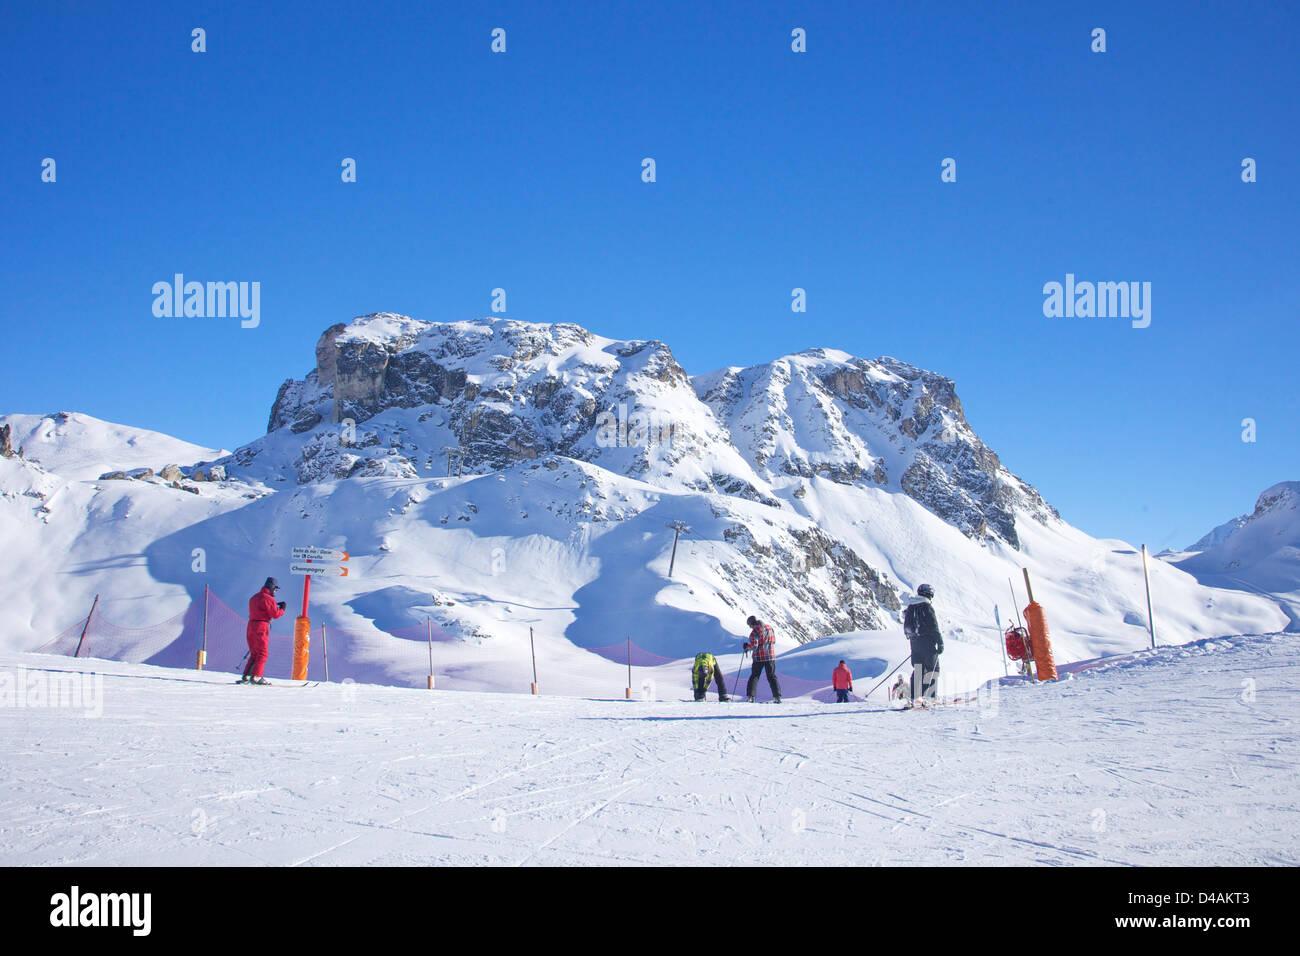 Levasset blue piste, top of La Rossa, winter sun, La Plagne, France, Europe - Stock Image